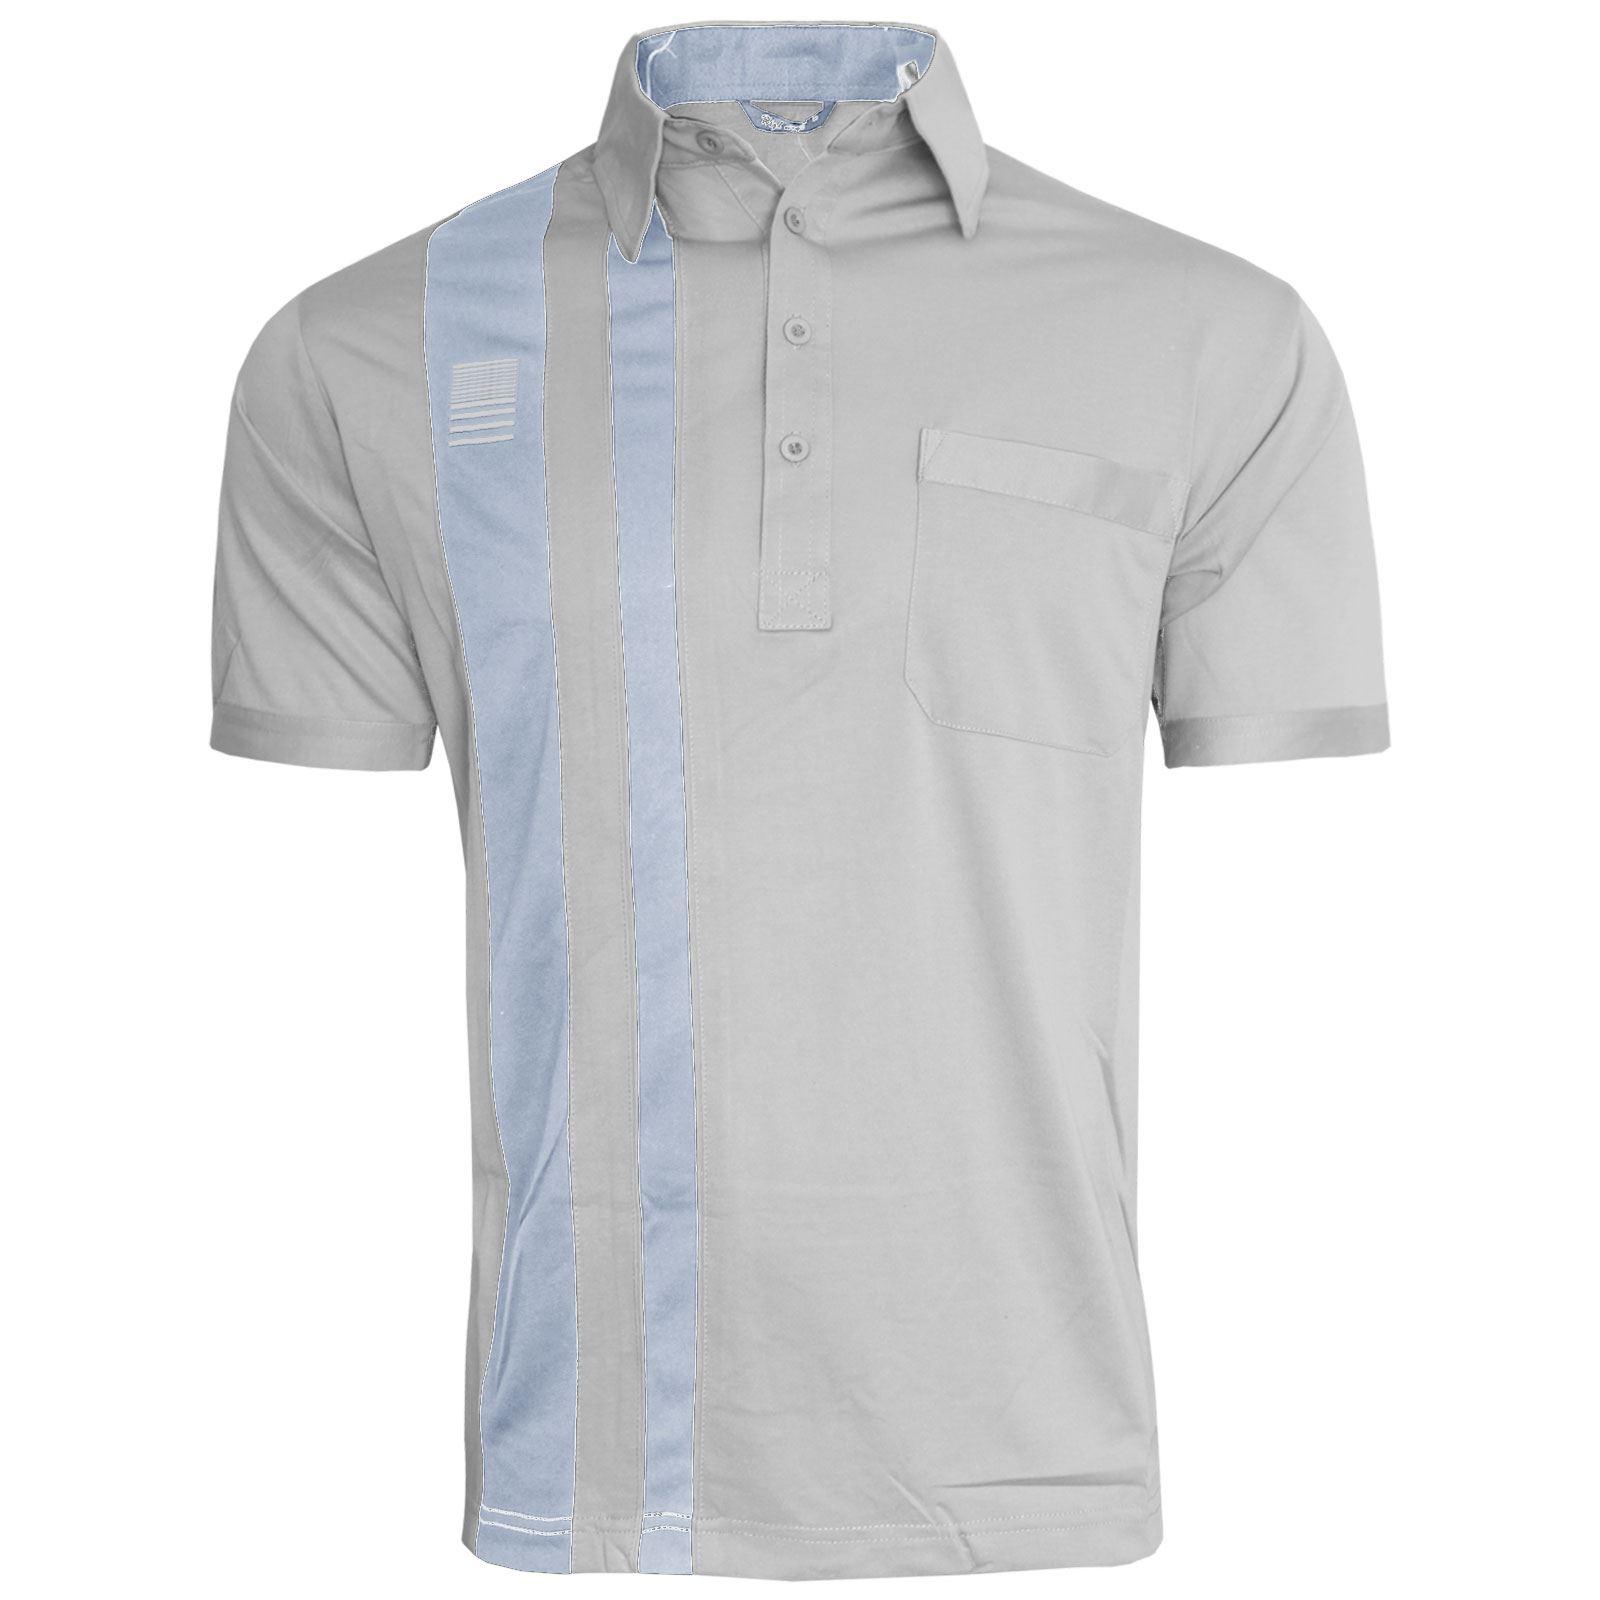 Mens polo t shirt plain shirt smart collar short sleeves for Xxl mens polo shirts